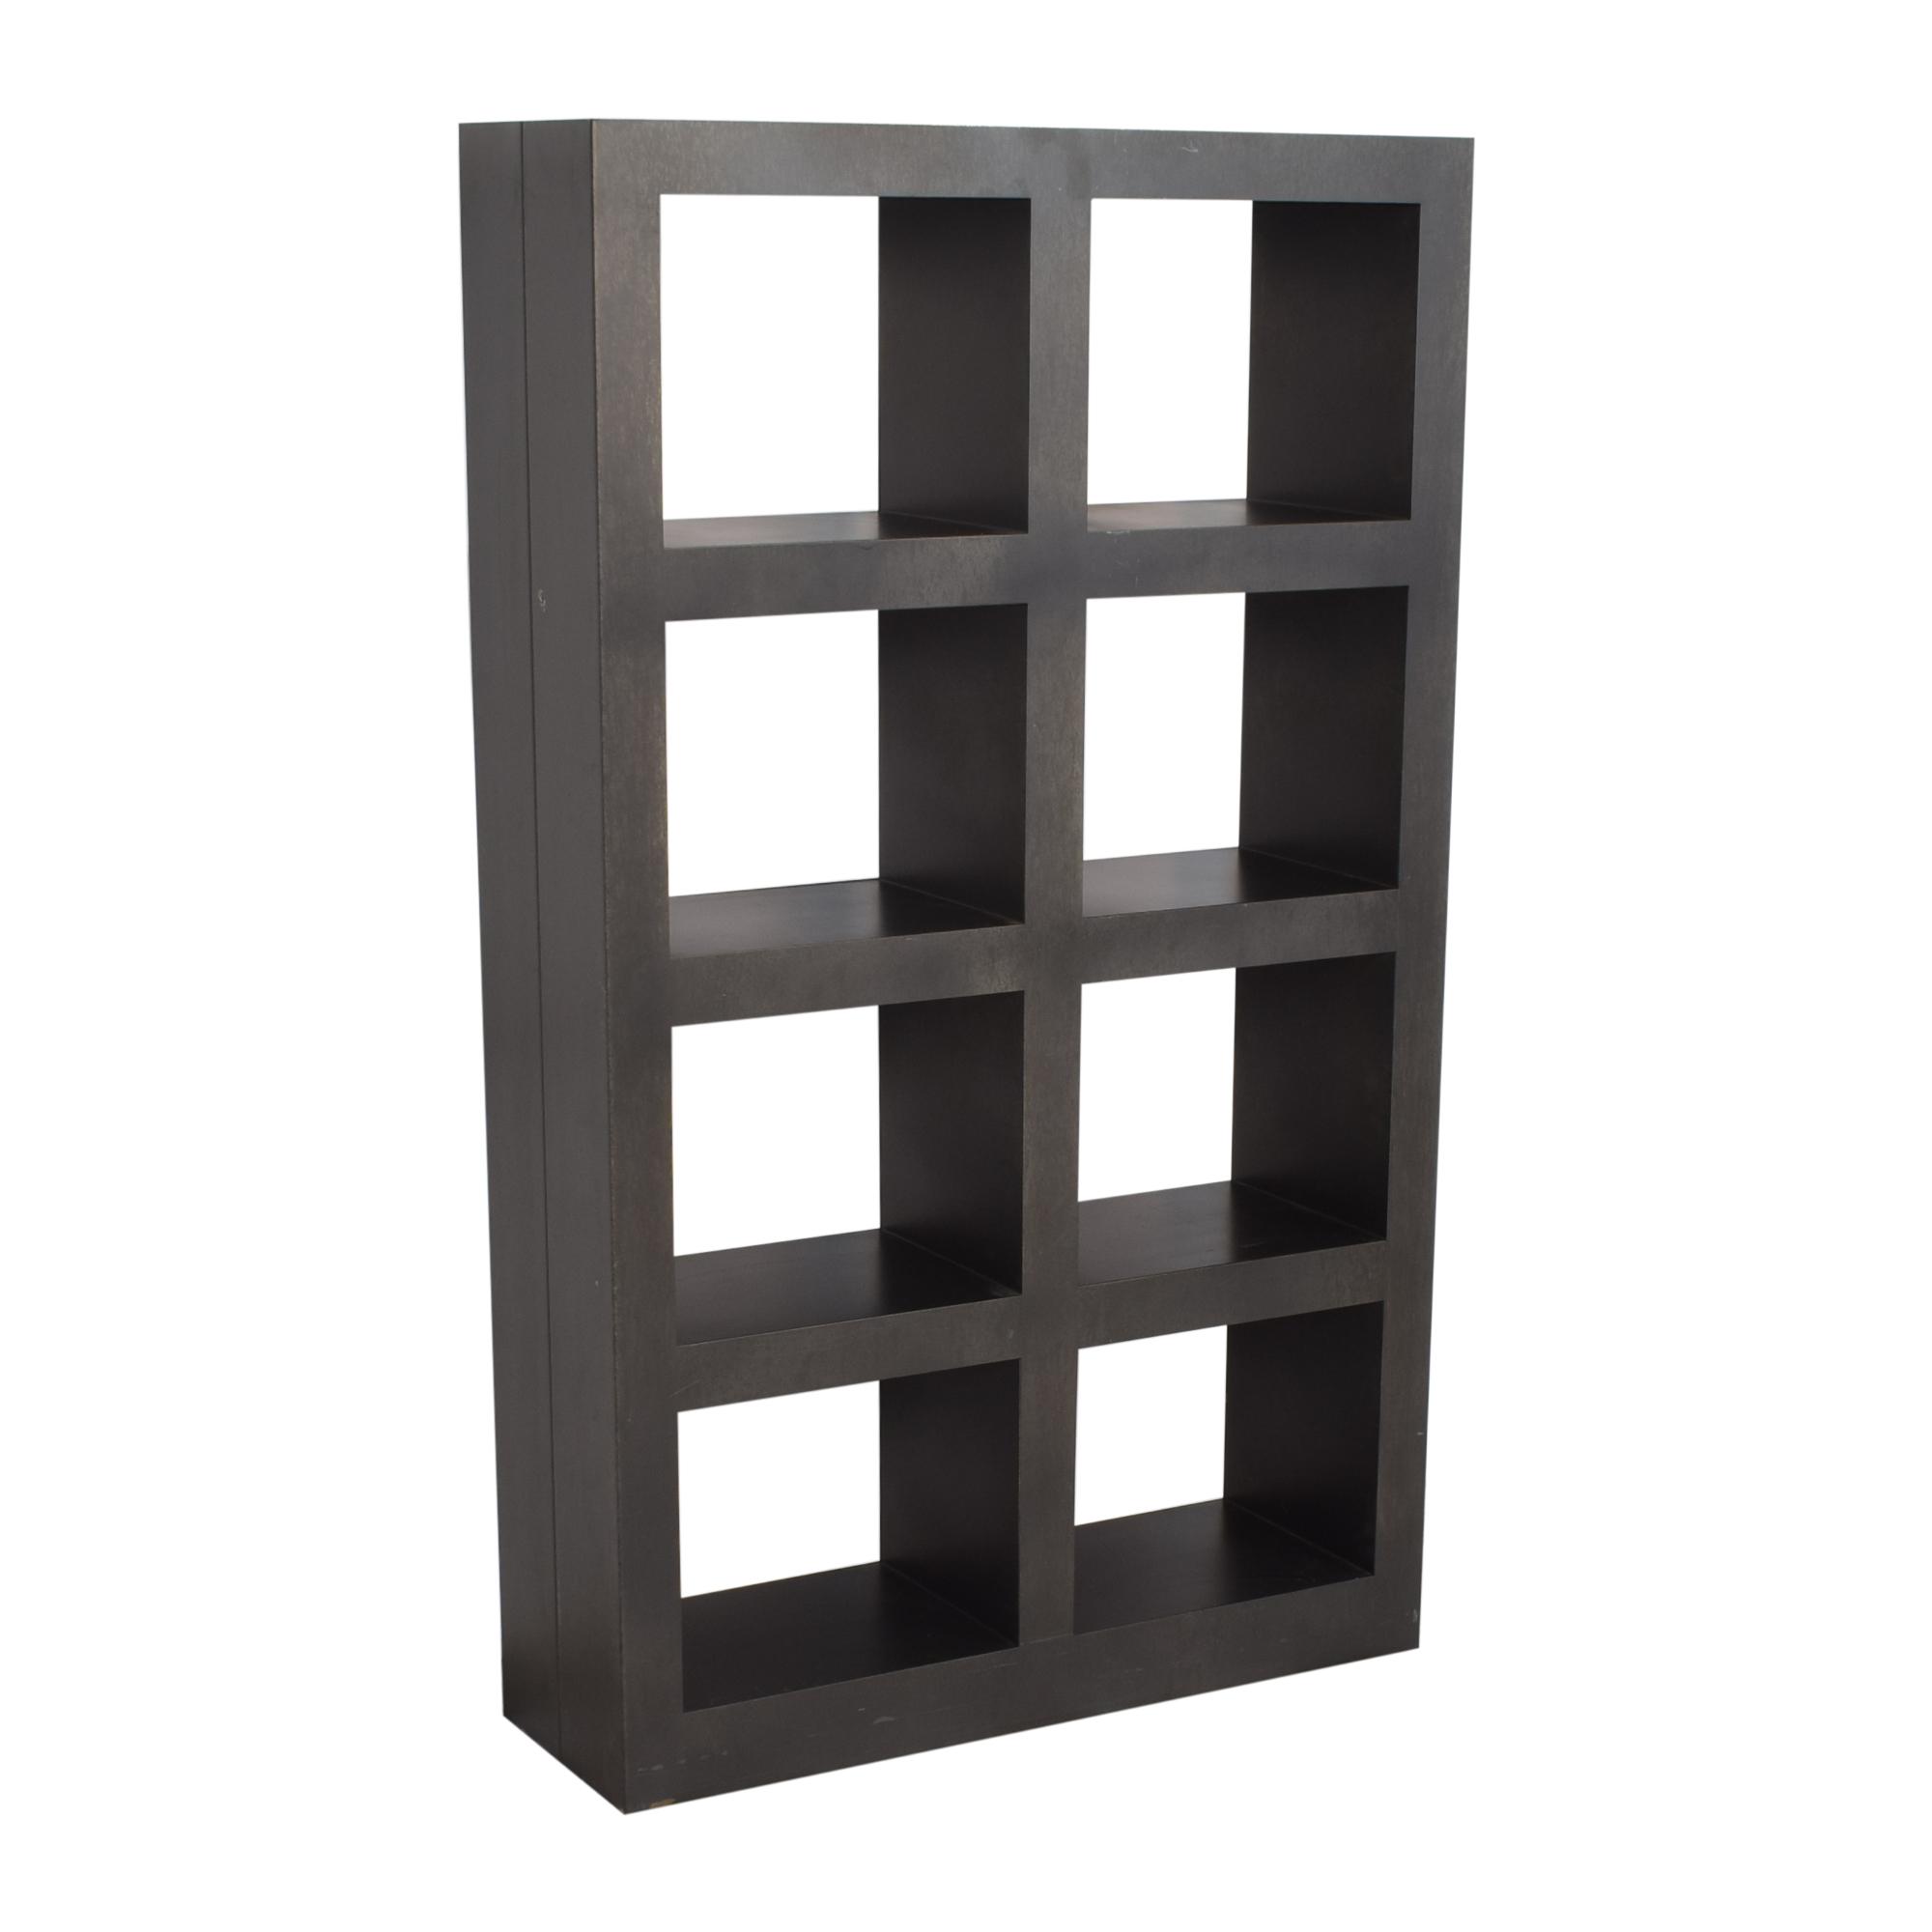 Crate & Barrel Crate & Barrel Shadow Box Tower dark grey